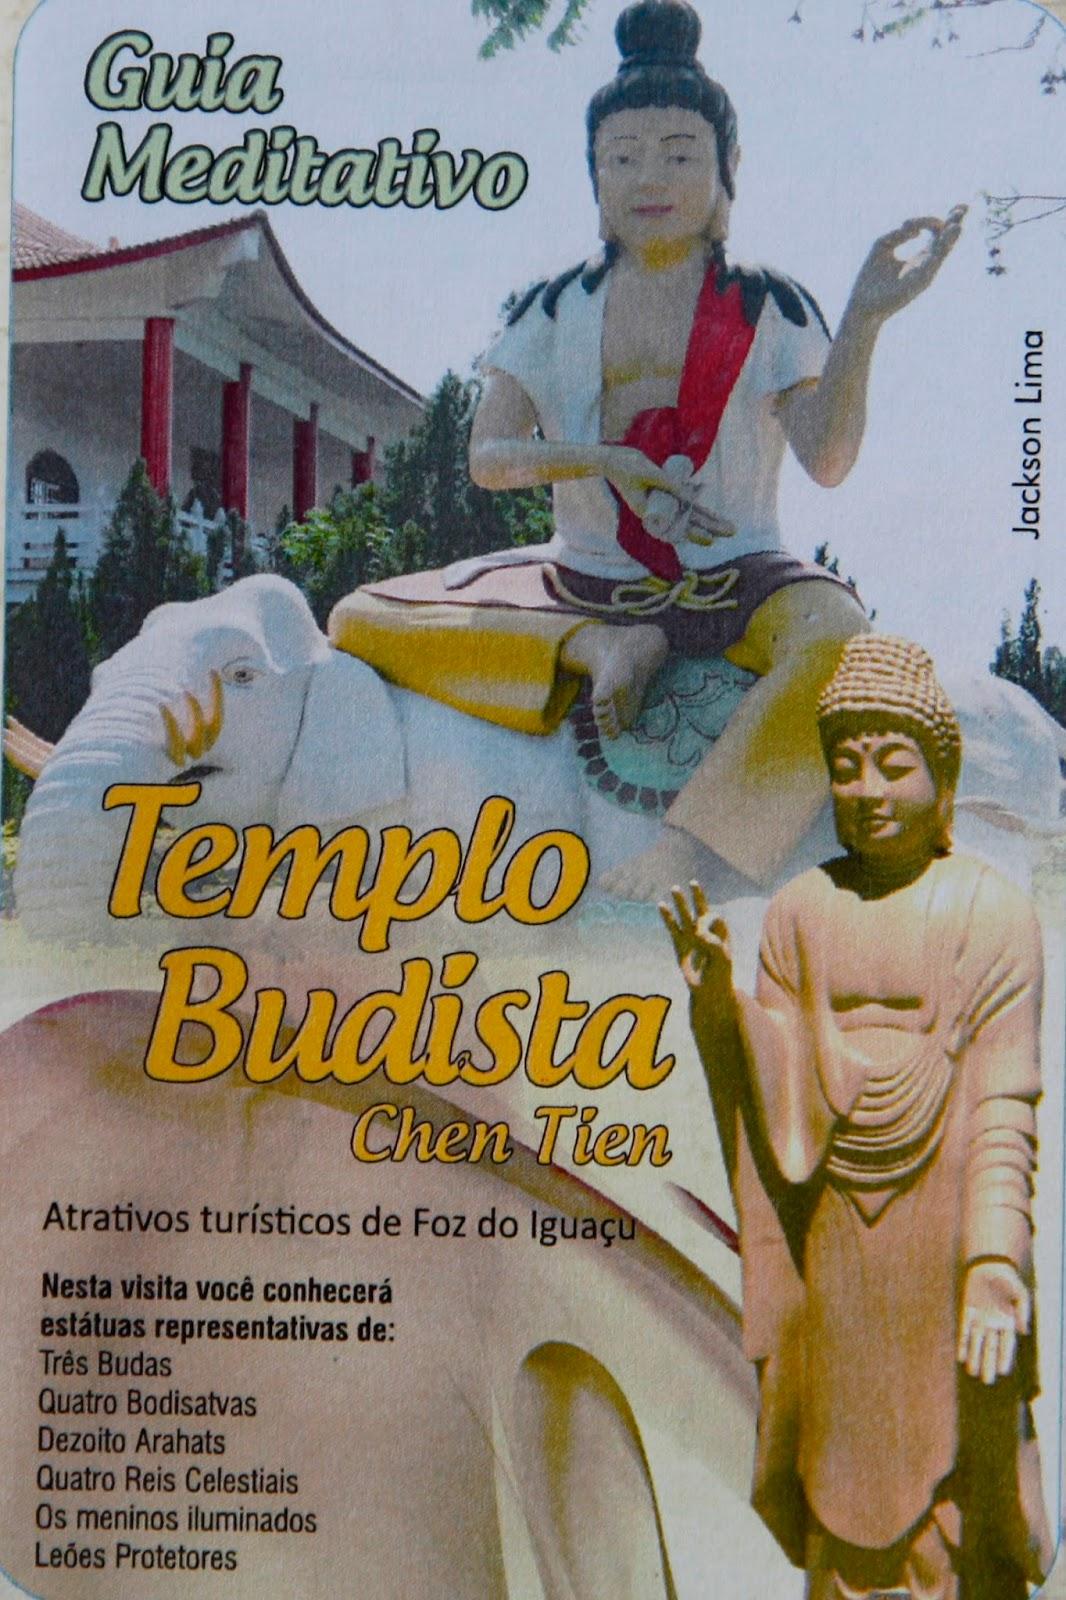 Templo Budista em Português